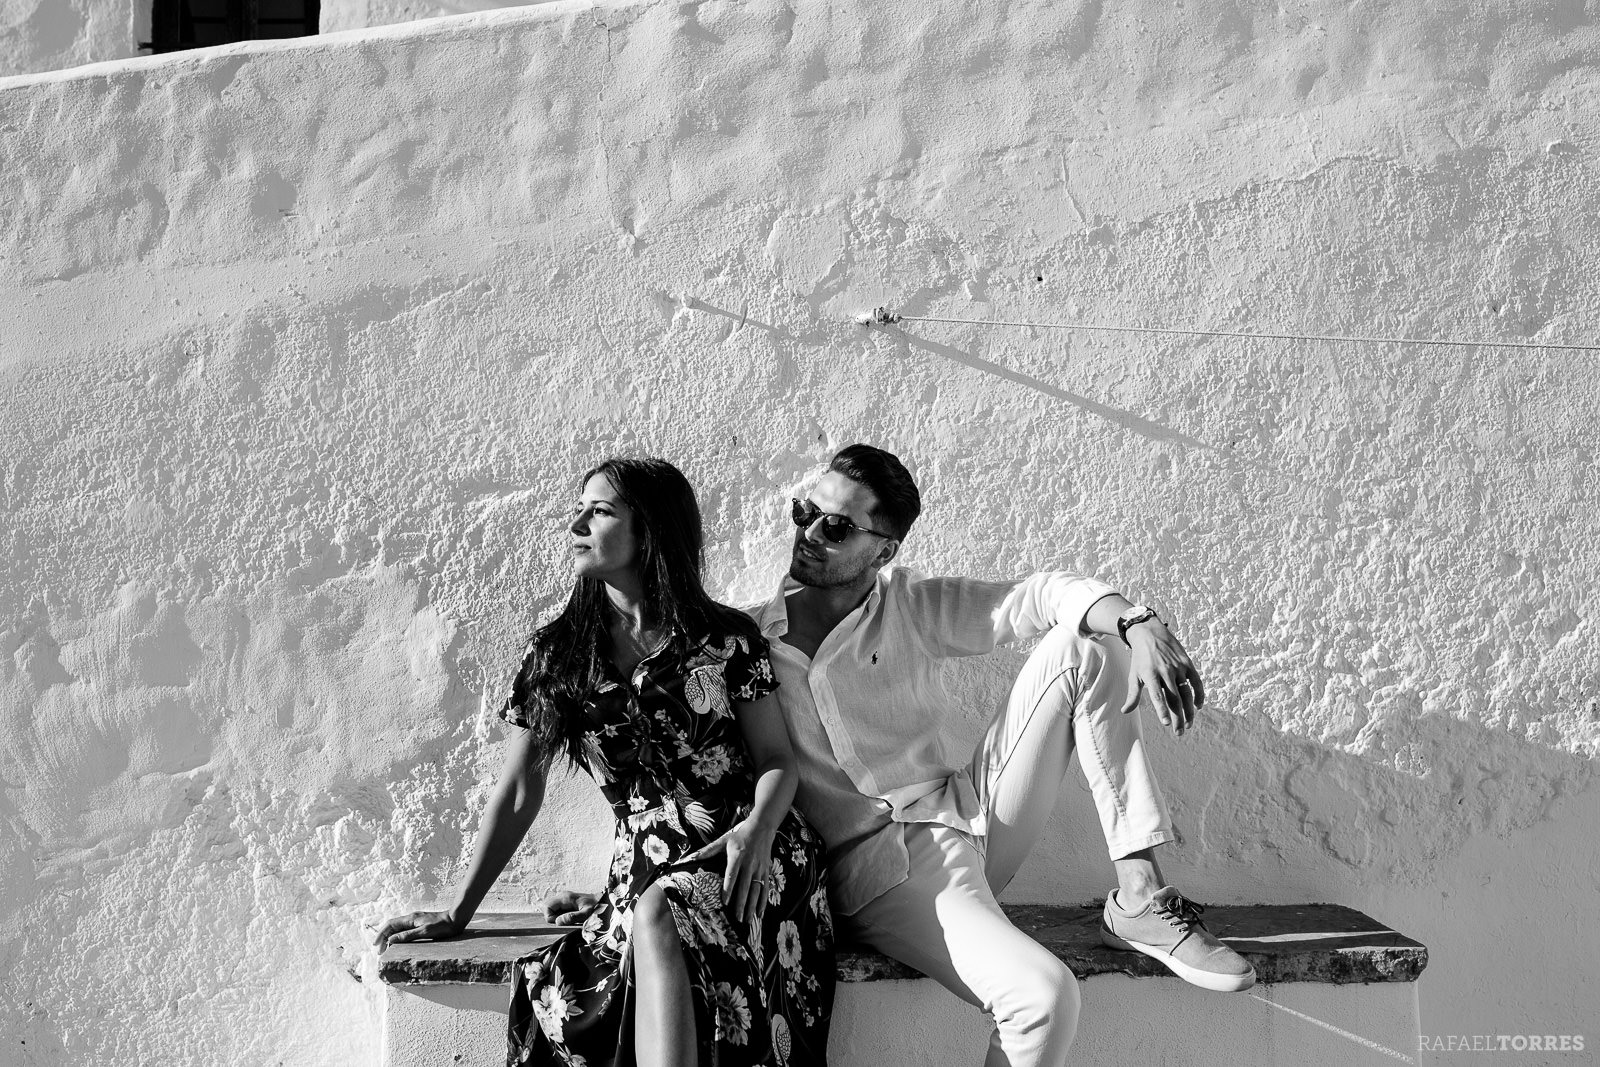 fotografo-preboda-vejer-frontera-cadiz-conil-meca-wedding-photography-rafael-torres-natural-photo-15.jpg